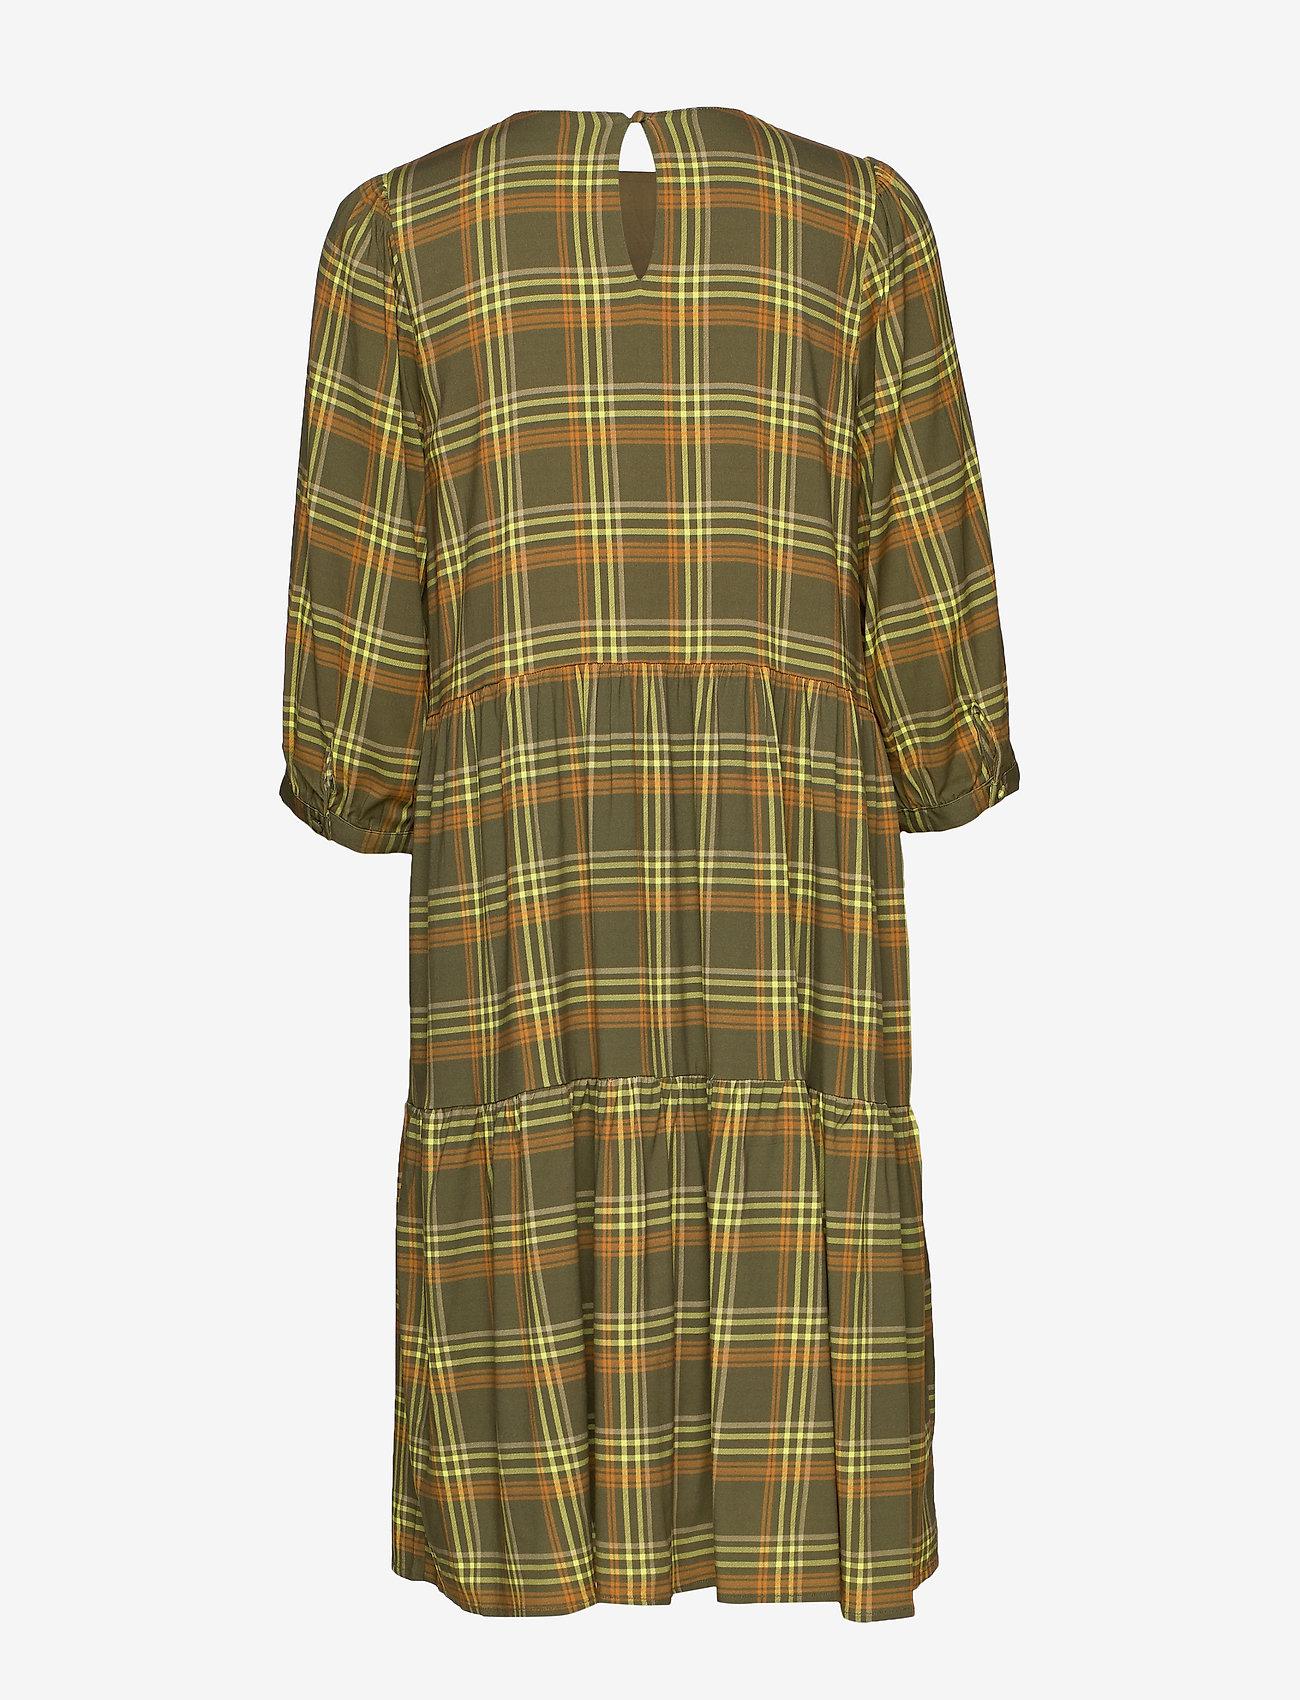 Cadygz Dress Ms20 (Army Check) (59.50 €) - Gestuz ilJq5